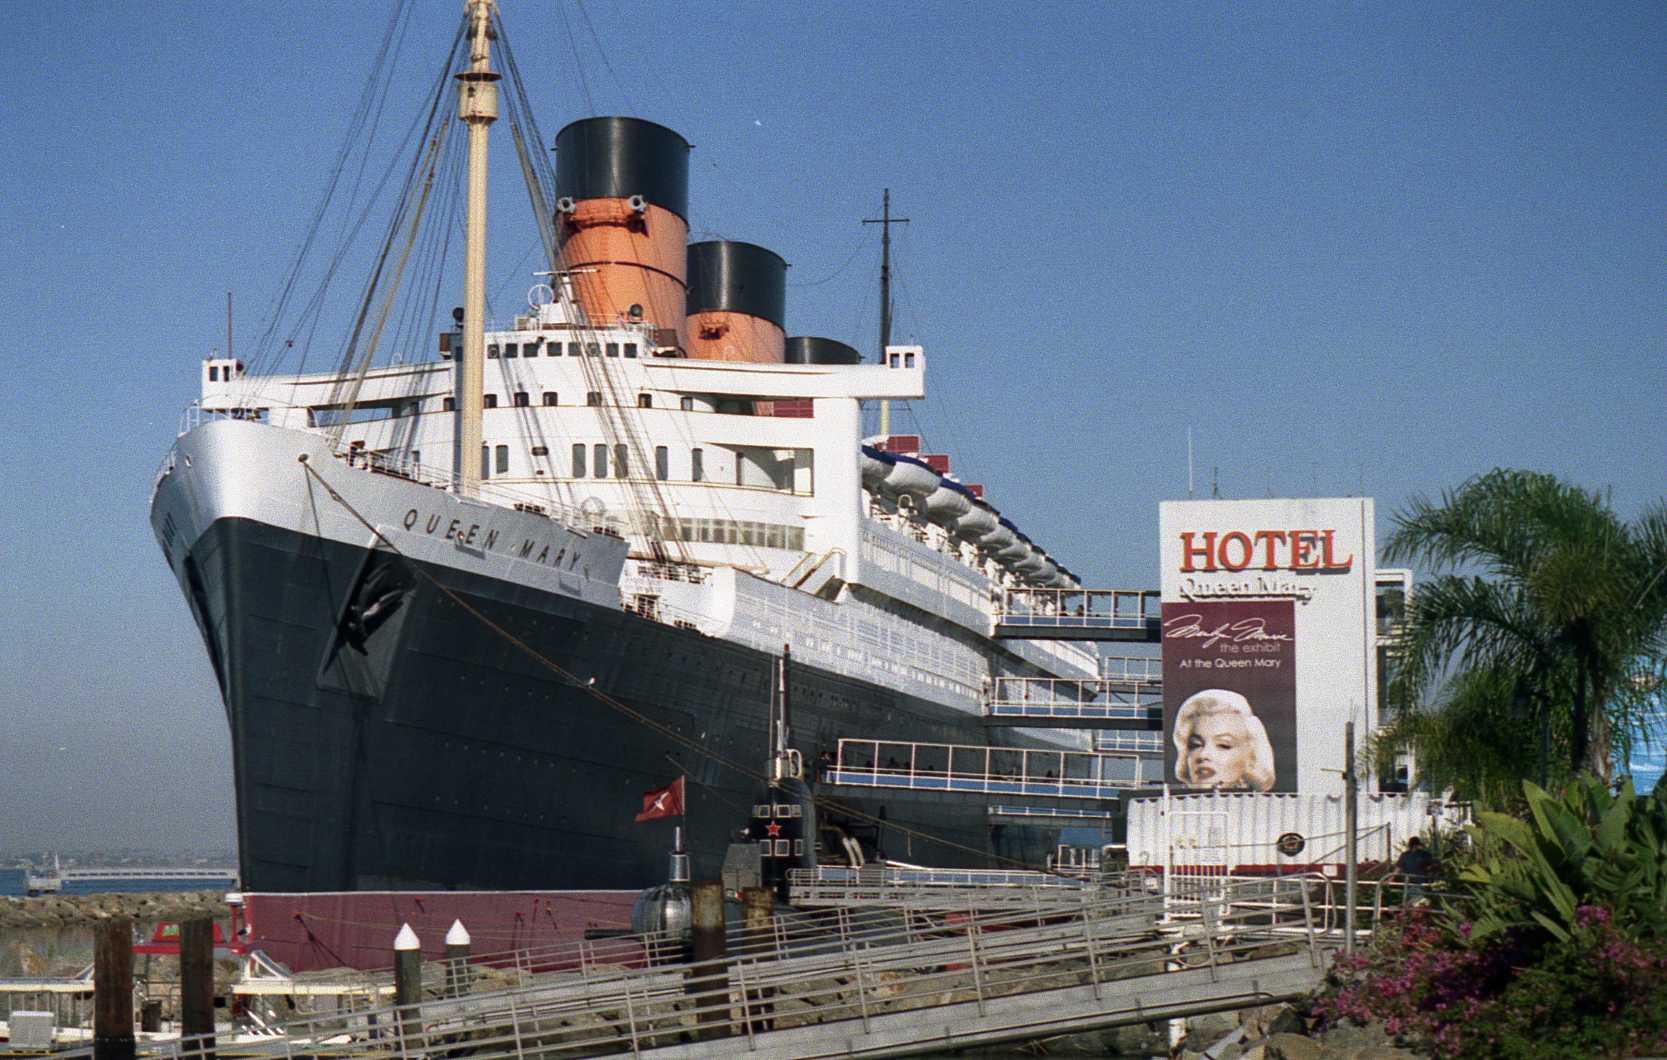 Queen Mary Hotel America California Long Beach